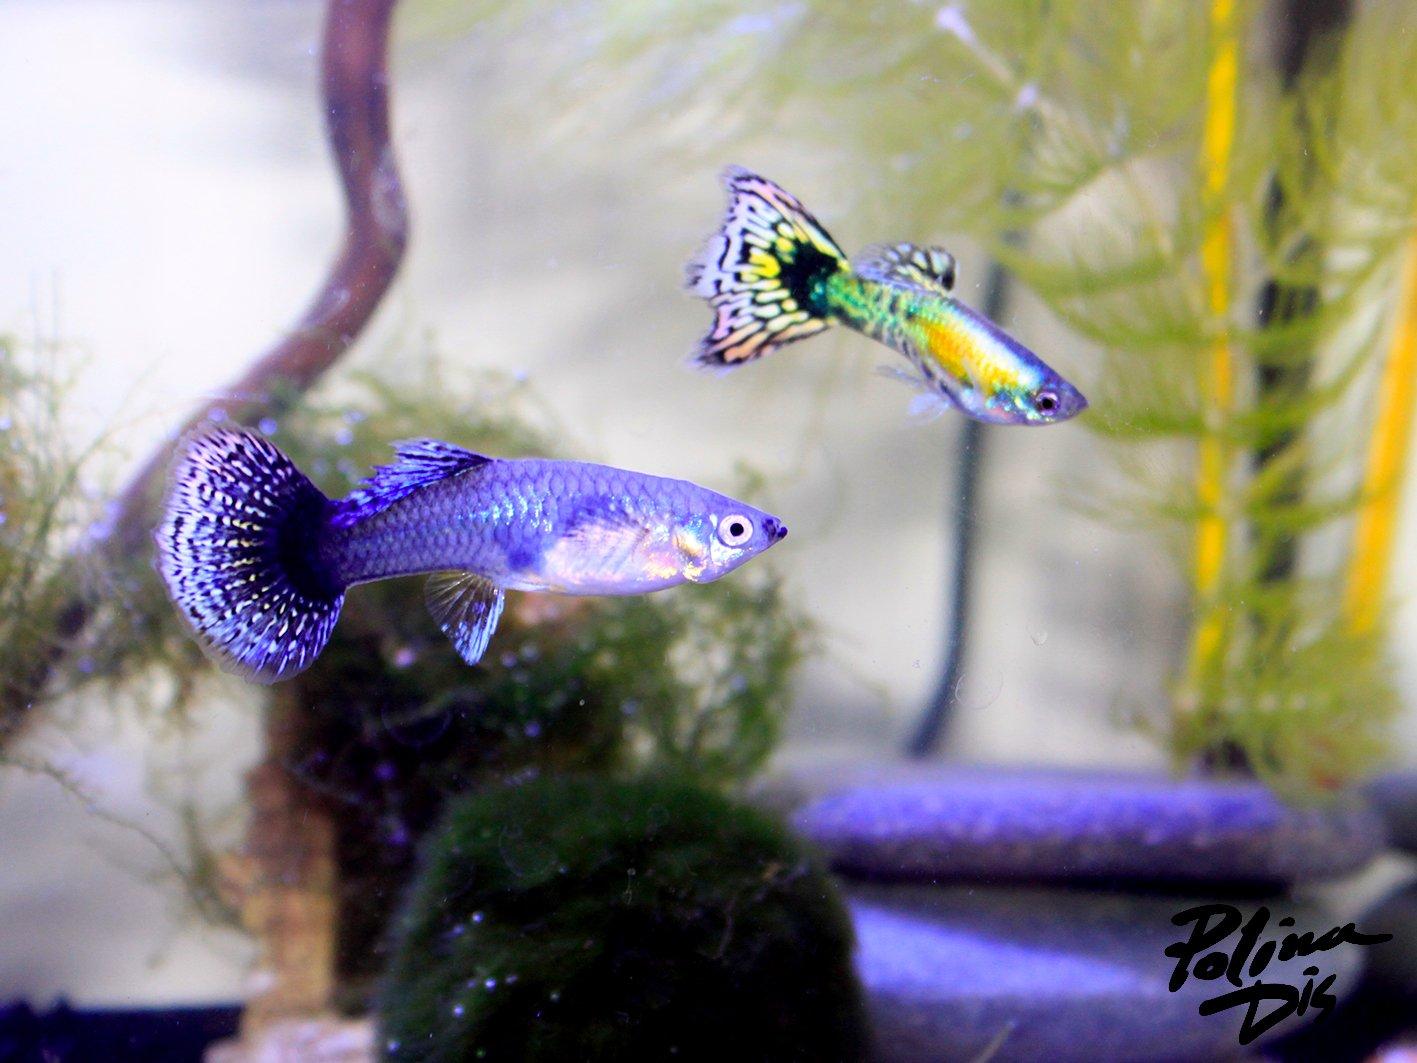 Fish-0042.jpg